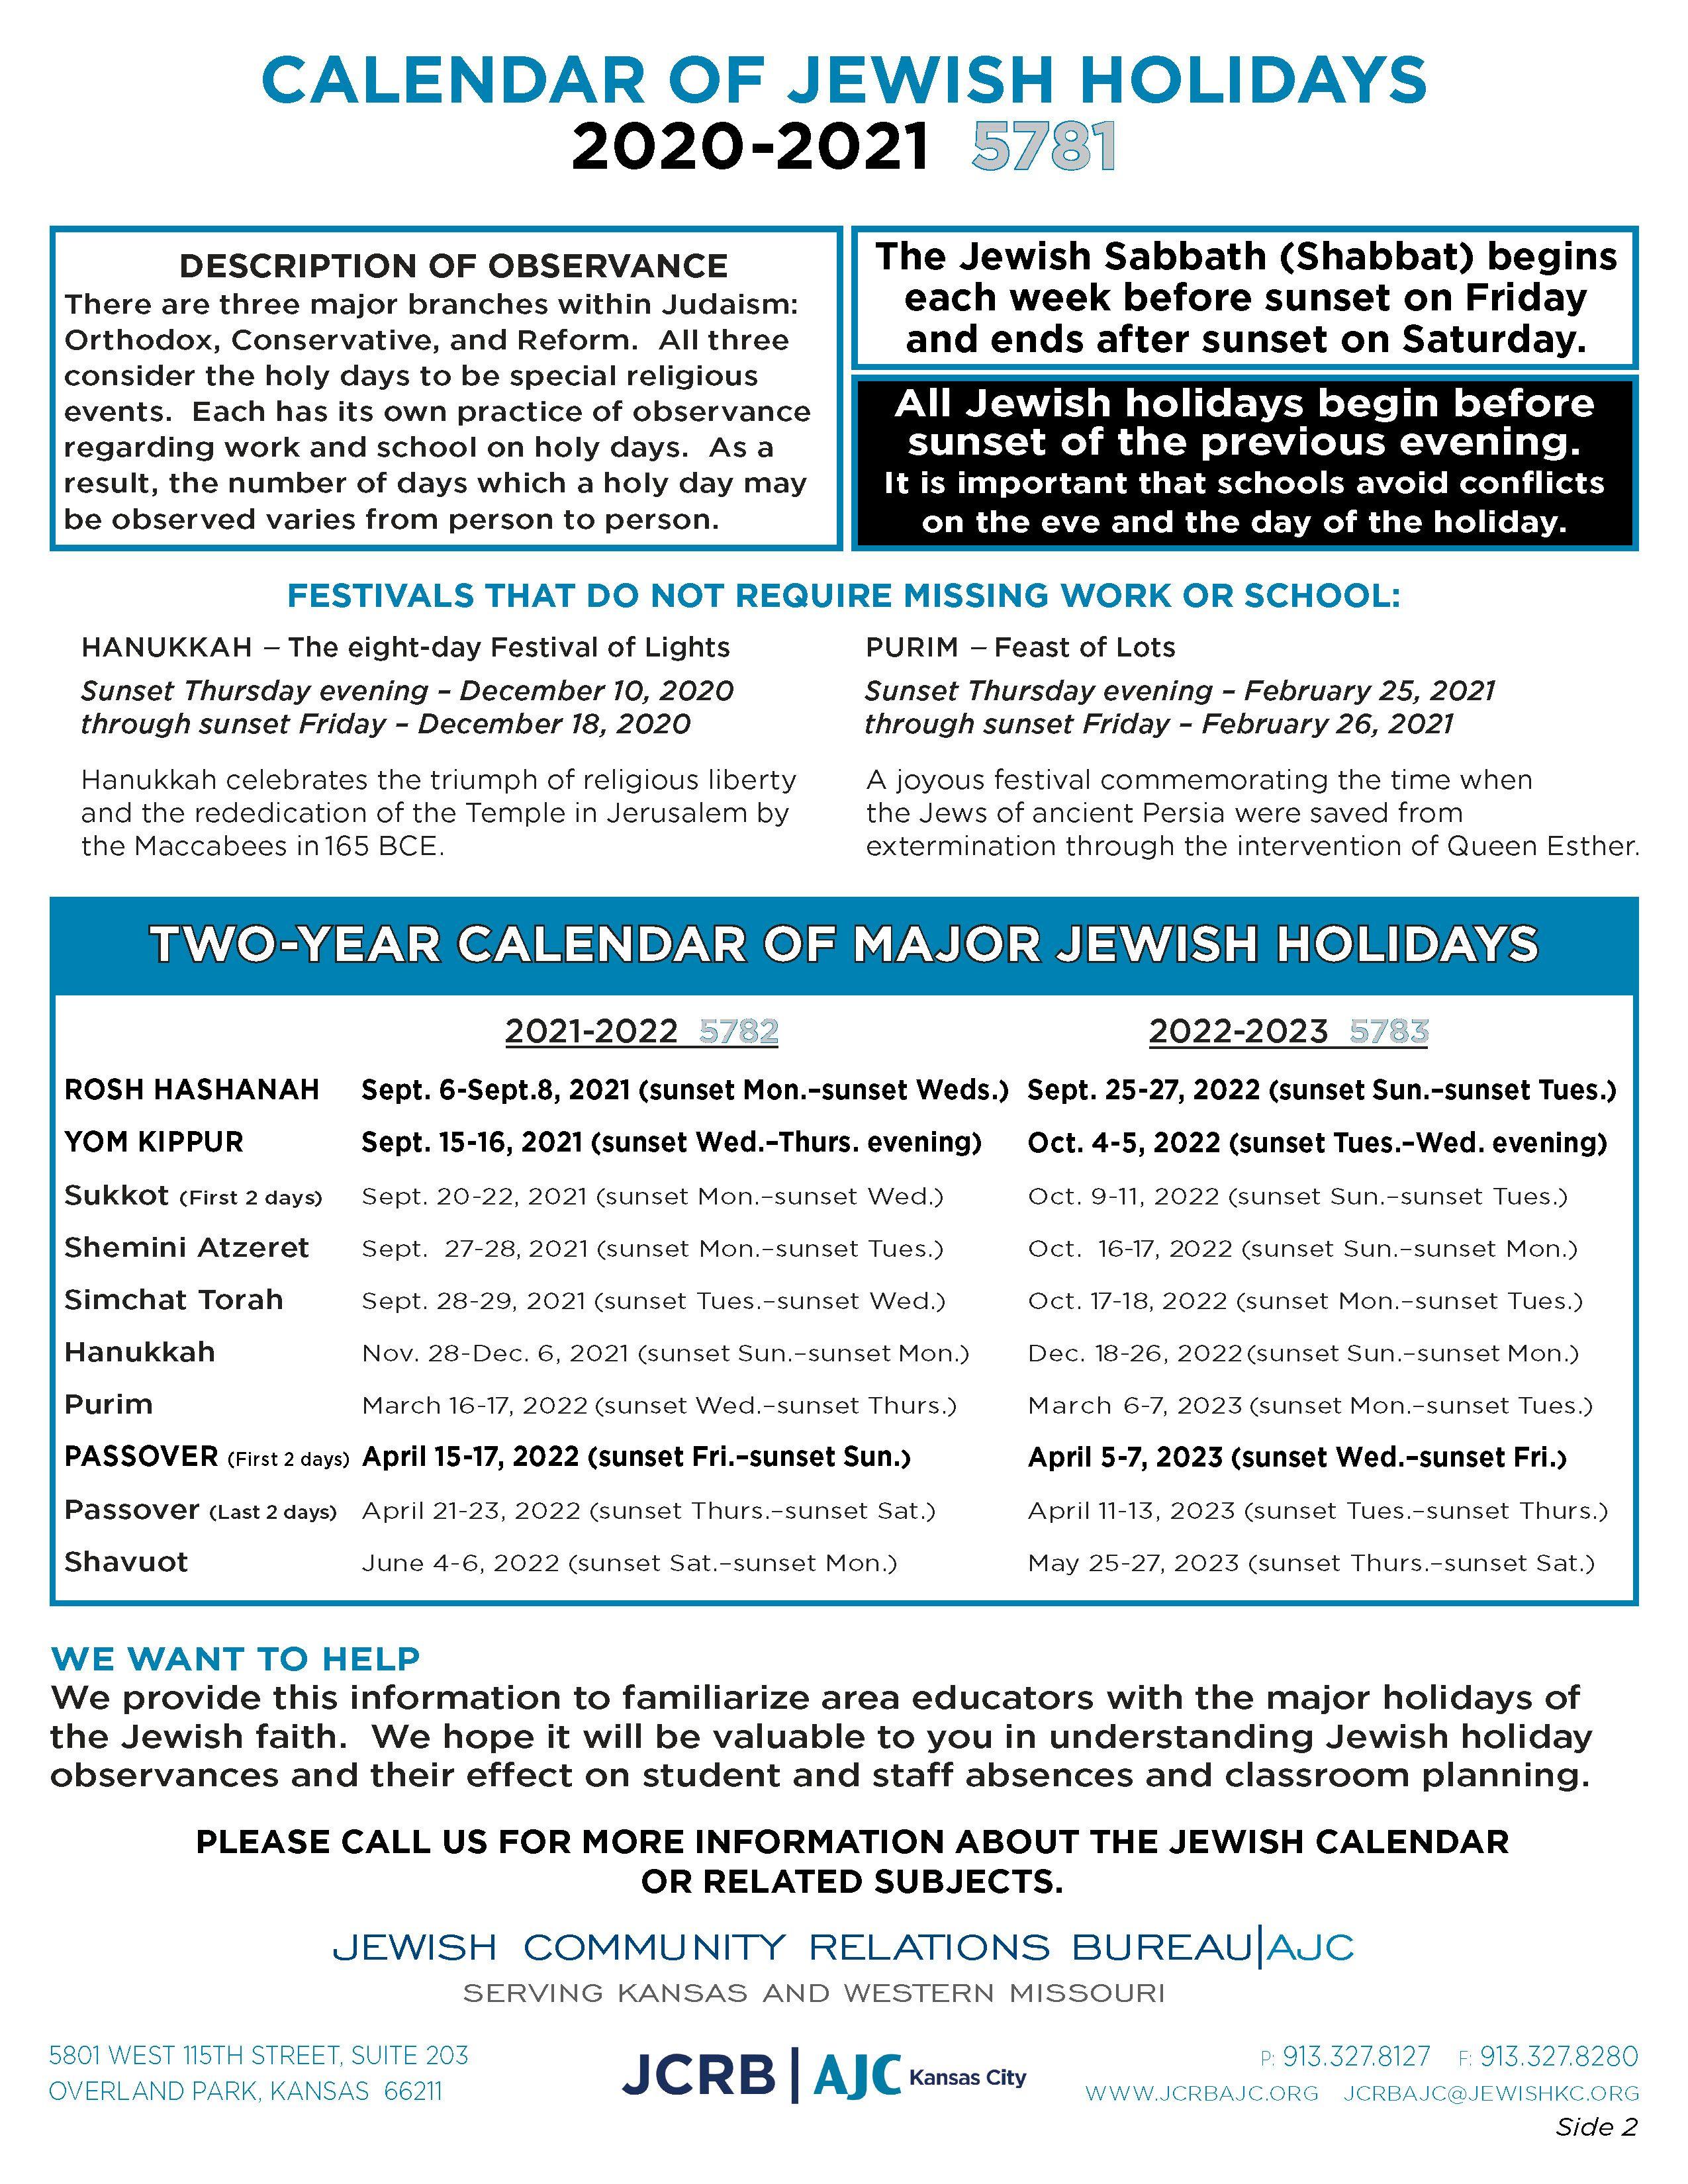 2020-2021 Calendar of Jewish Holidays